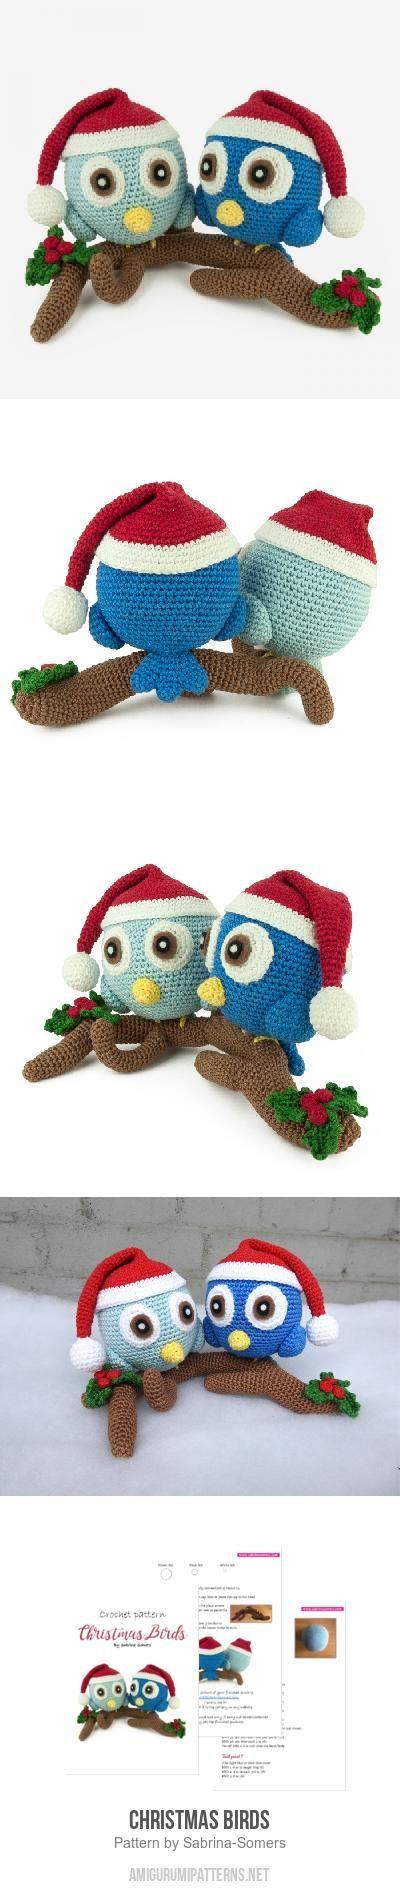 Christmas Birds amigurumi pattern | ideas | Pinterest | Prensa ...